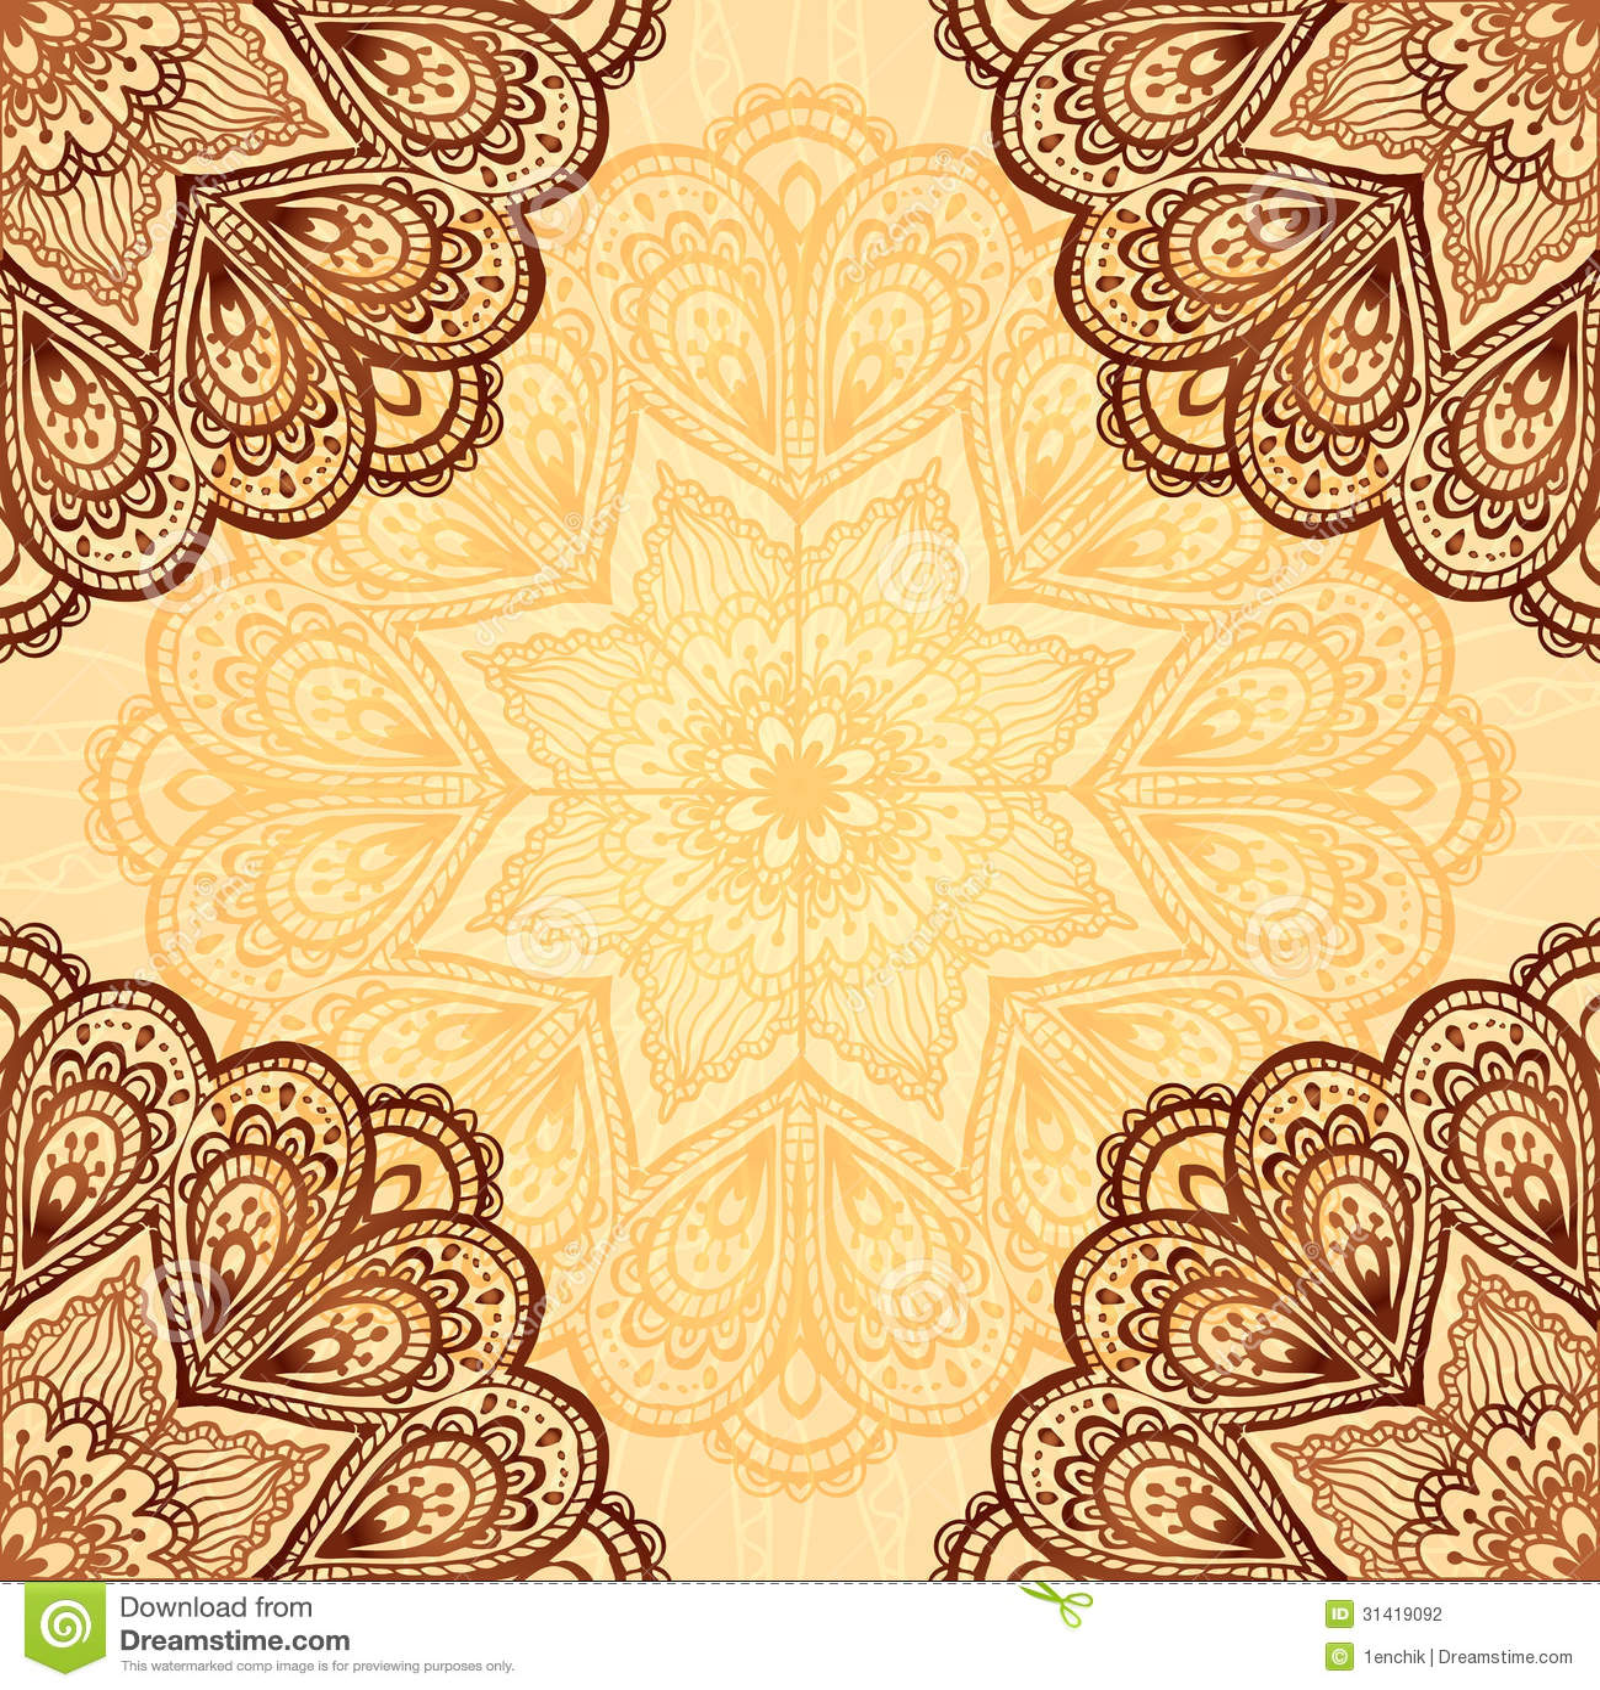 Ornate Napkin Vector Background In Henna Colors Stock Vector